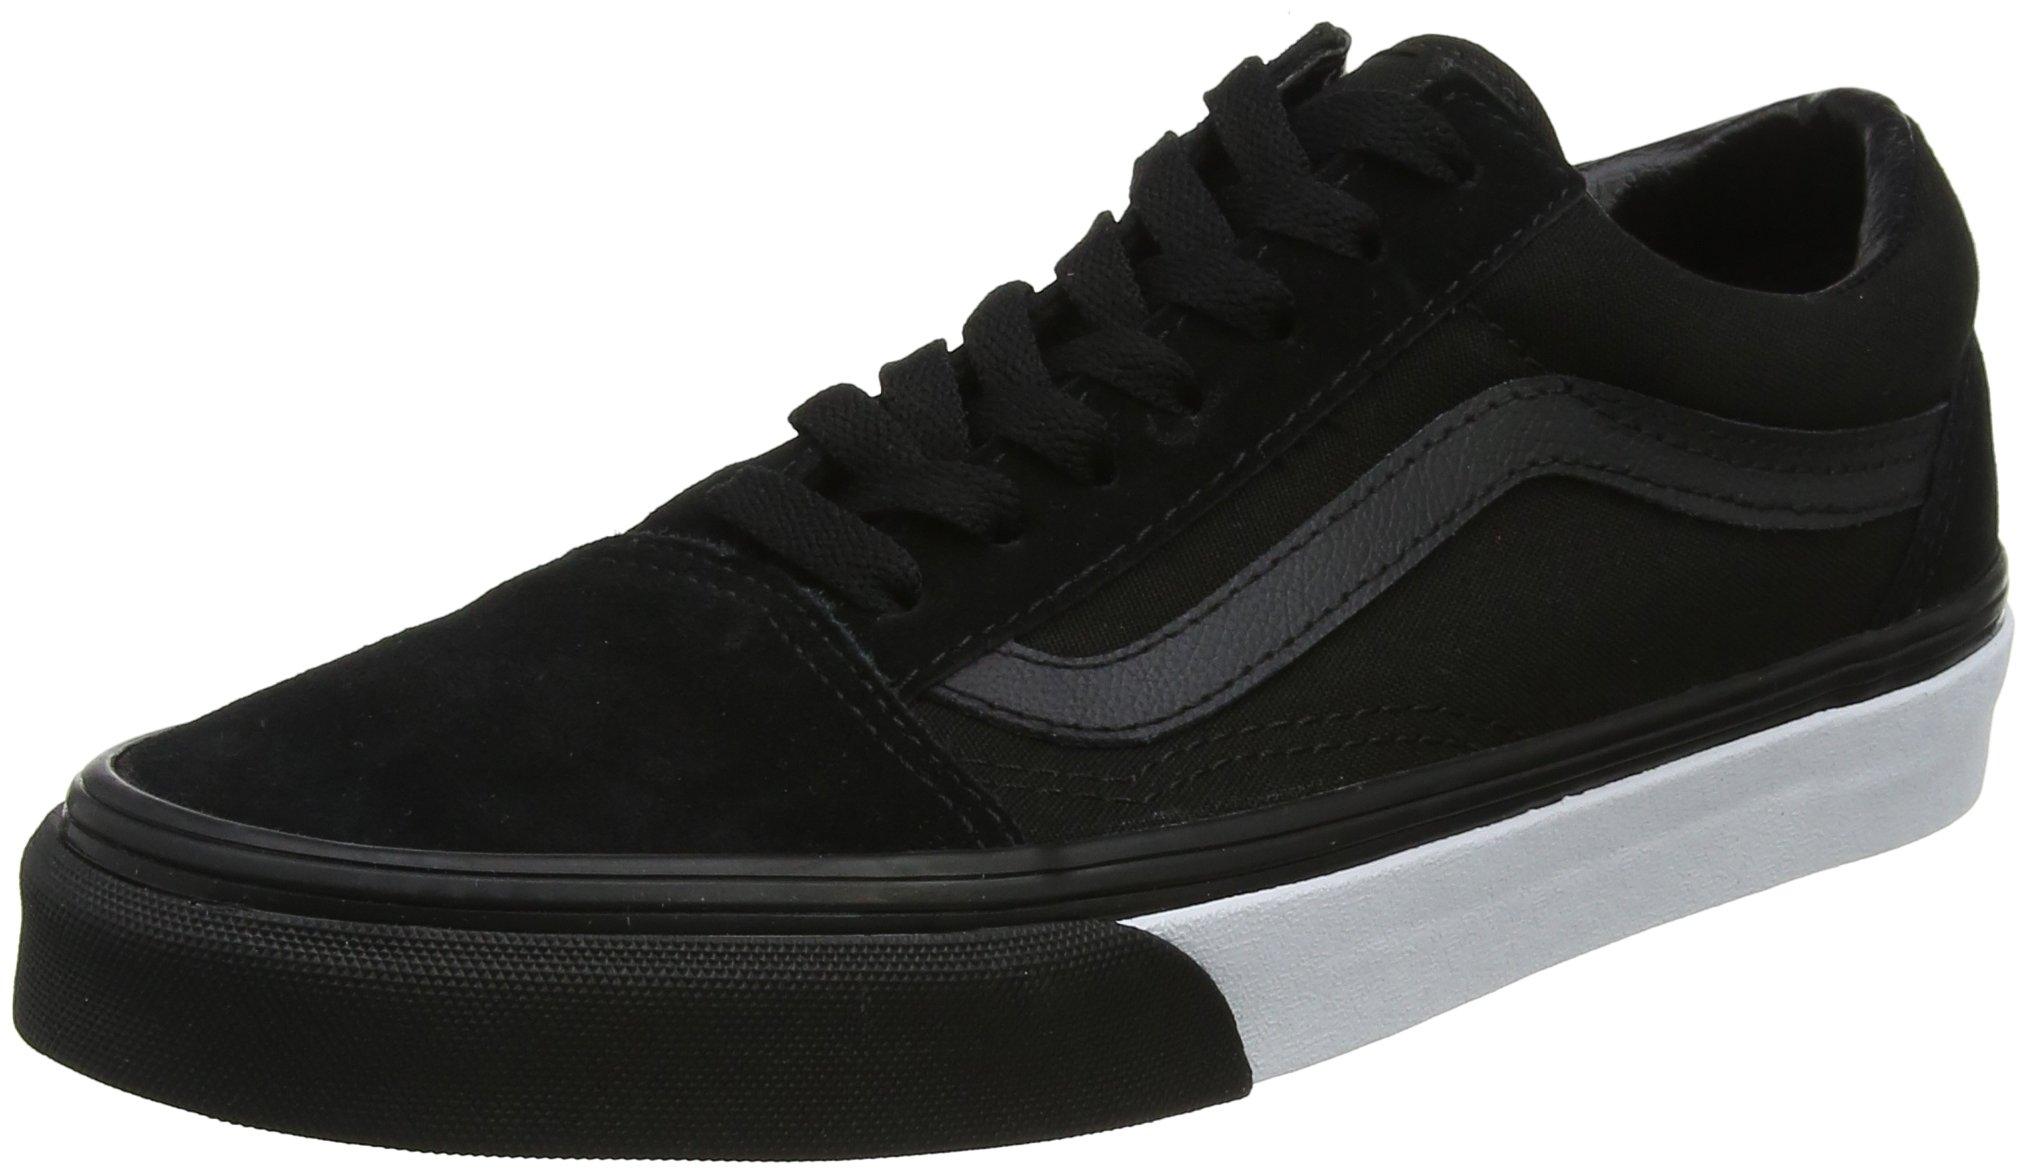 Vans Unisex Adults' Old Skool Trainers, Black ((Mono Bumper) Black/True White Q9C), 8 UK 42 EU